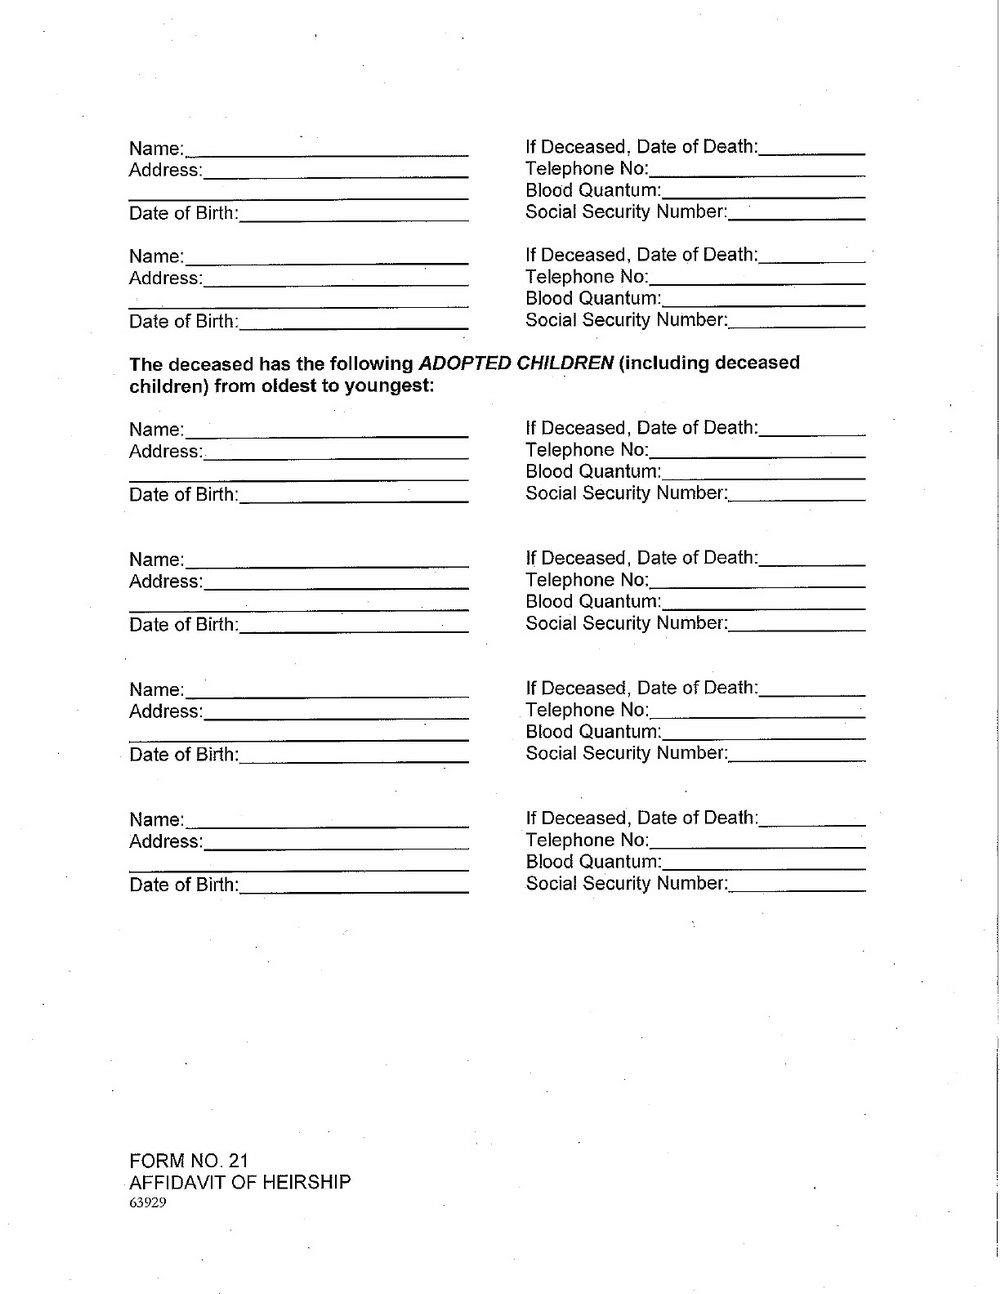 Free Affidavit Of Heirship Form